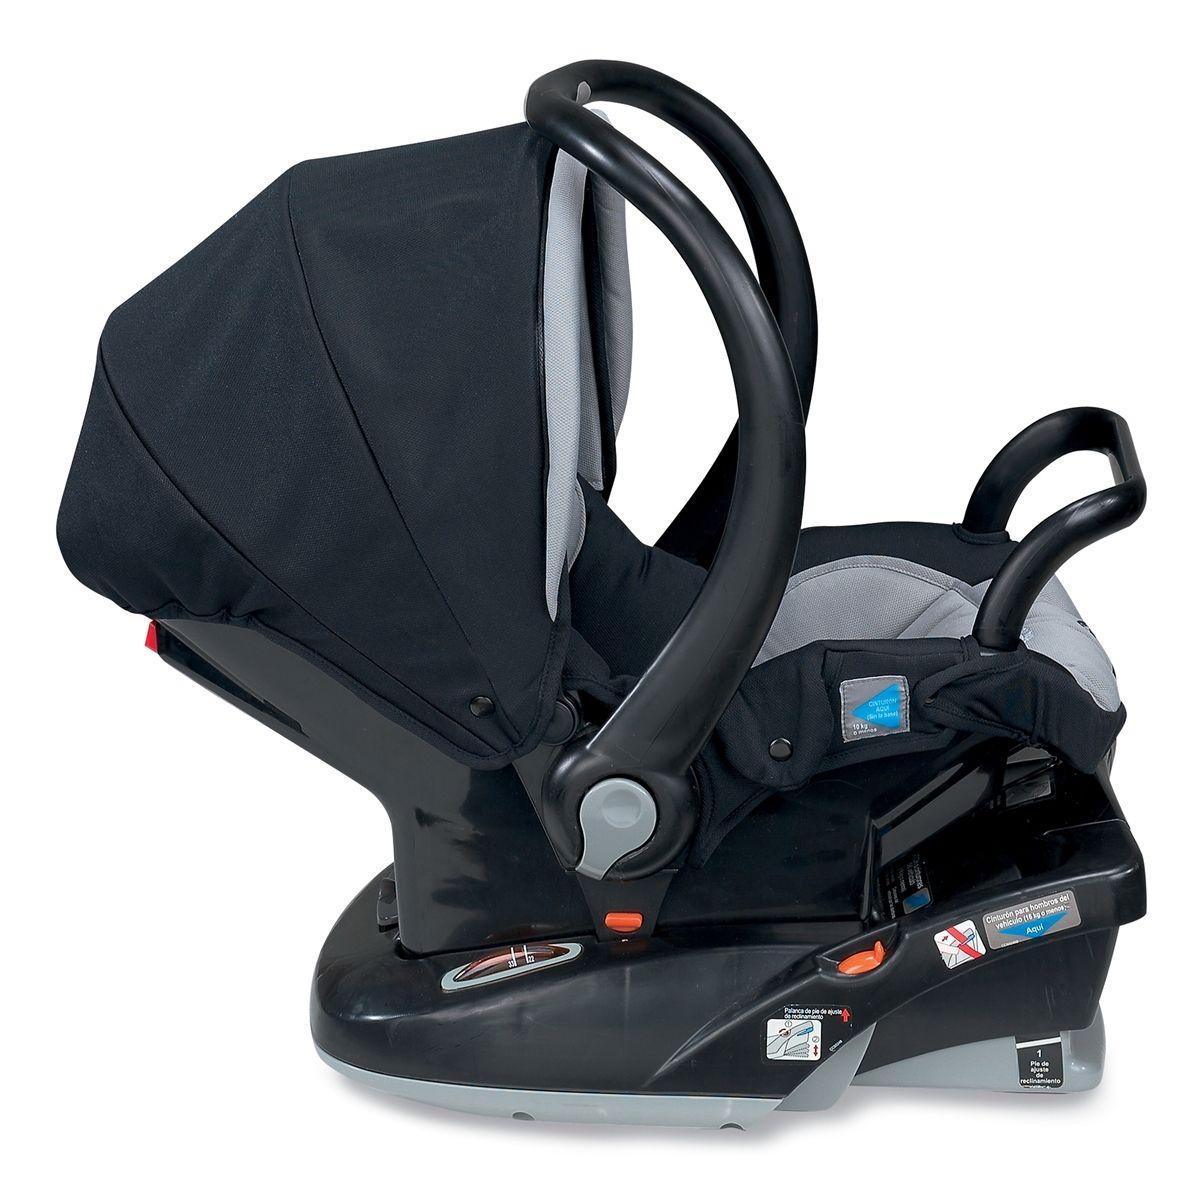 Shuttle Infant Car Seat Baby Car Seats Infant Car Seat Base Best Baby Car Seats